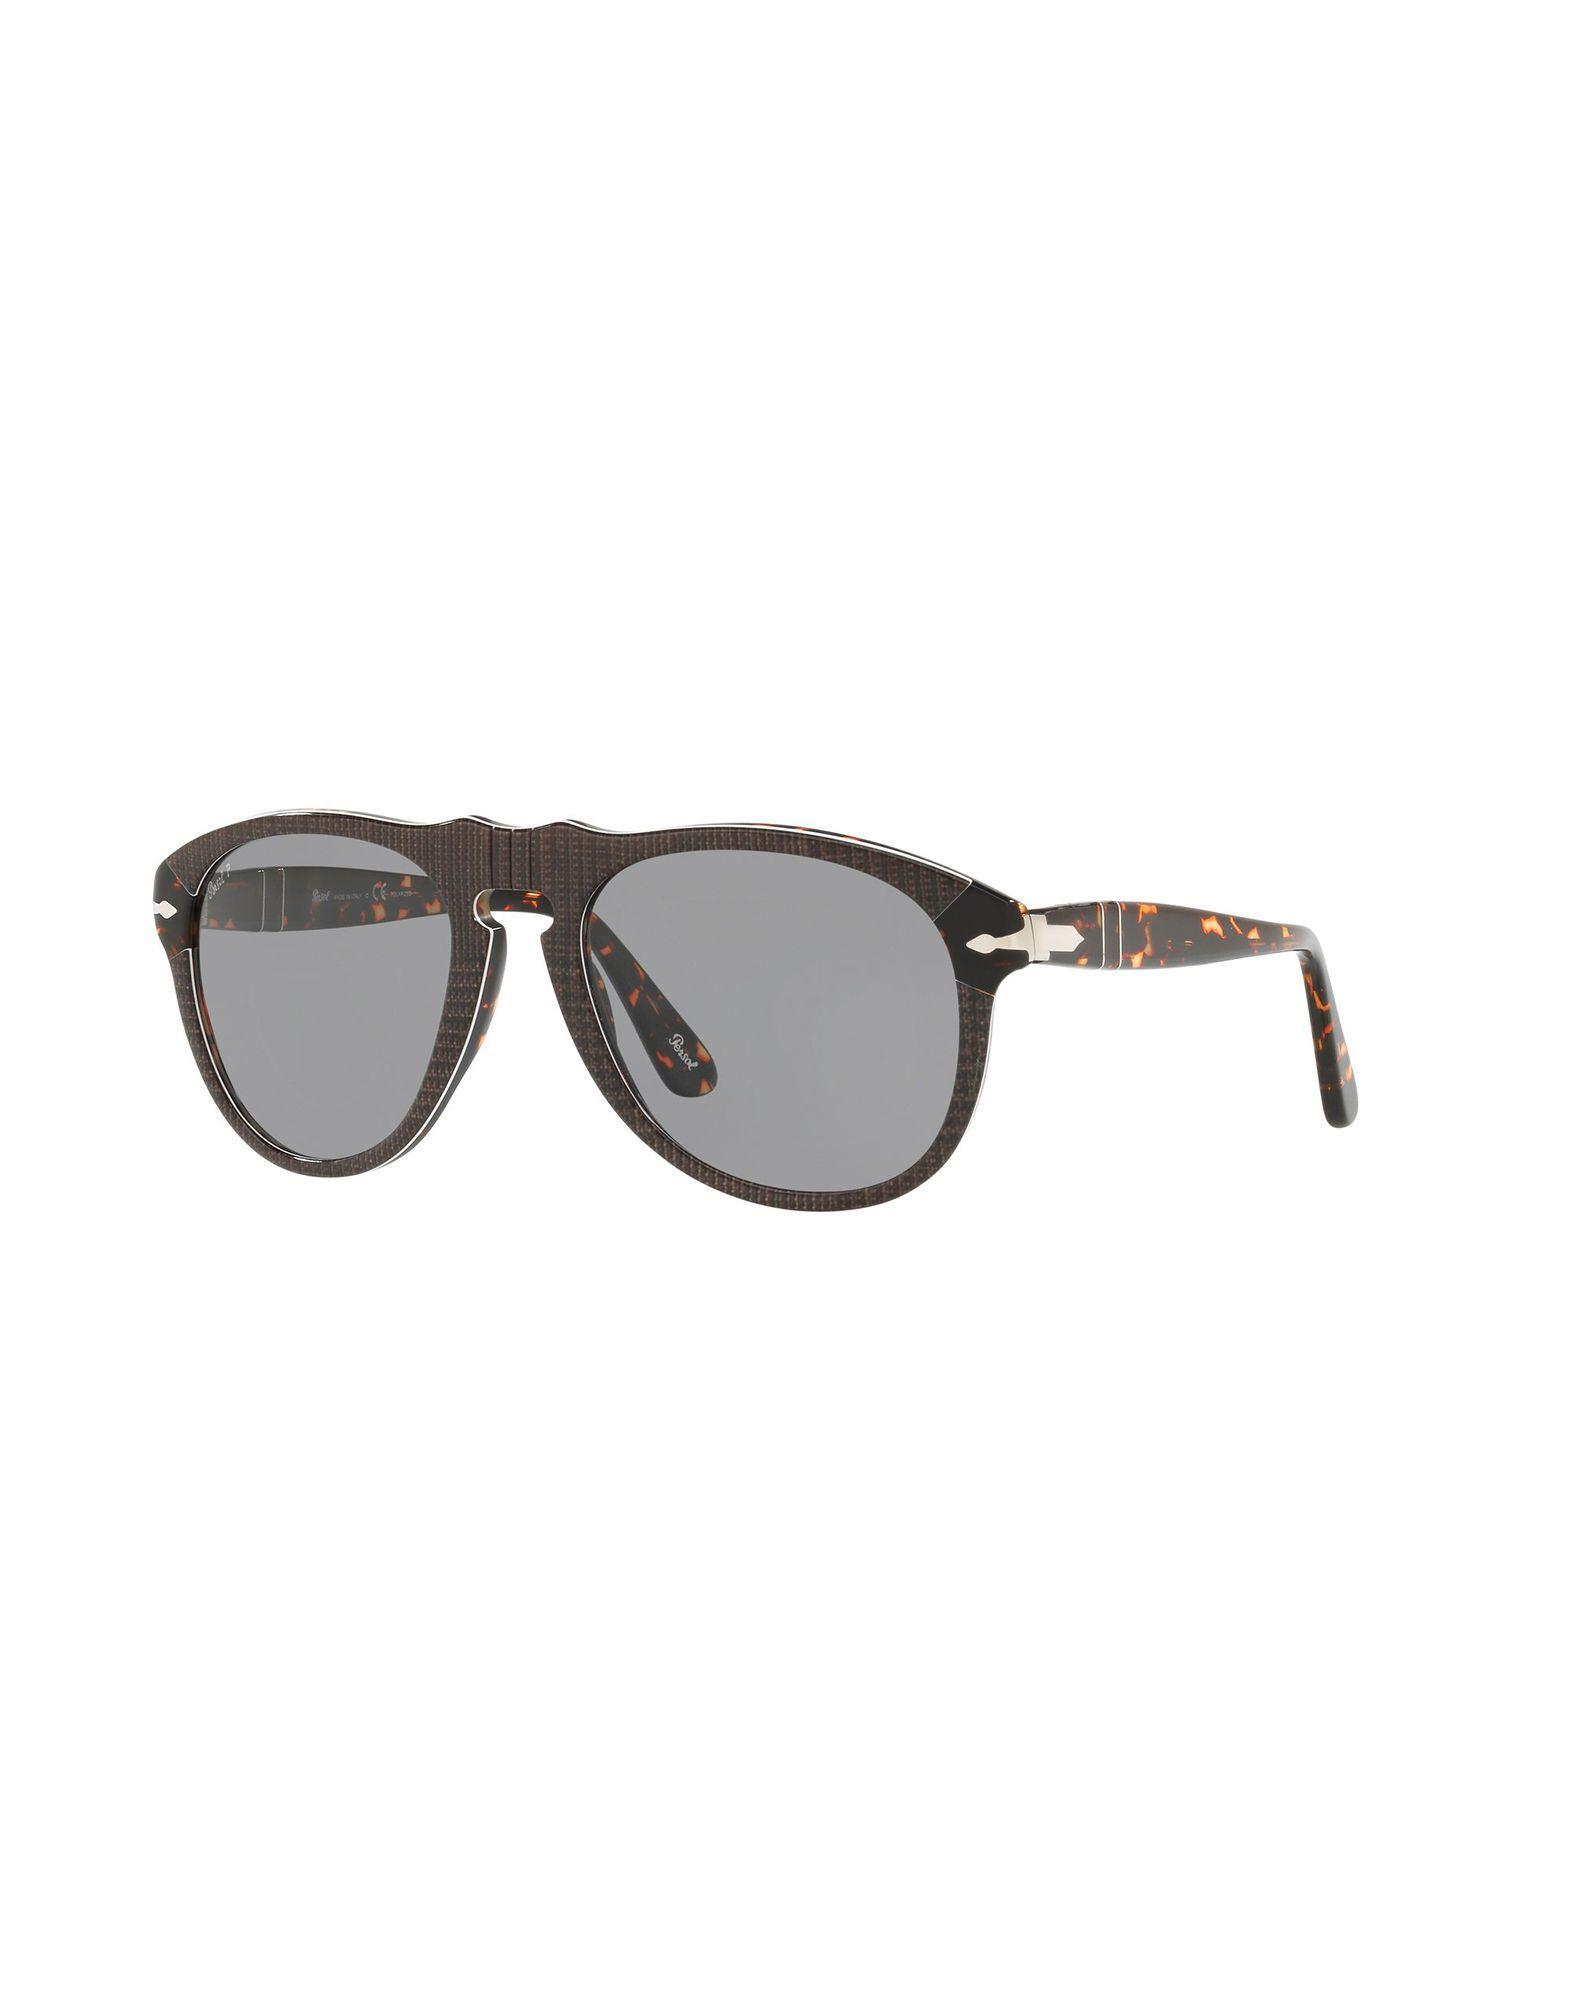 ca9e322b1c0b4 Persol - Black Sunglasses for Men - Lyst. View fullscreen